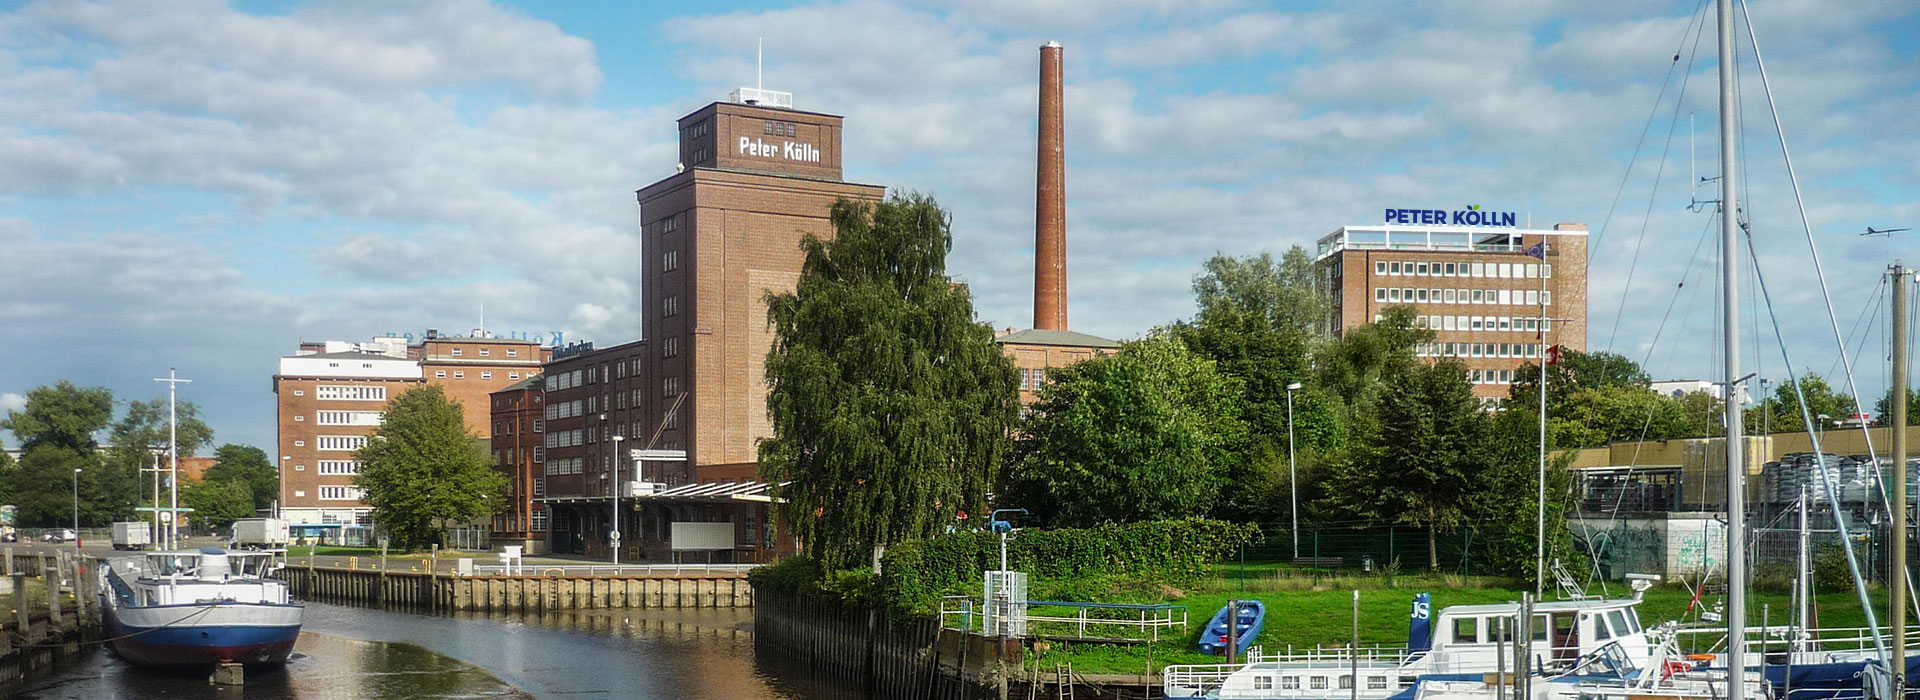 Company Premises Peter Koelln